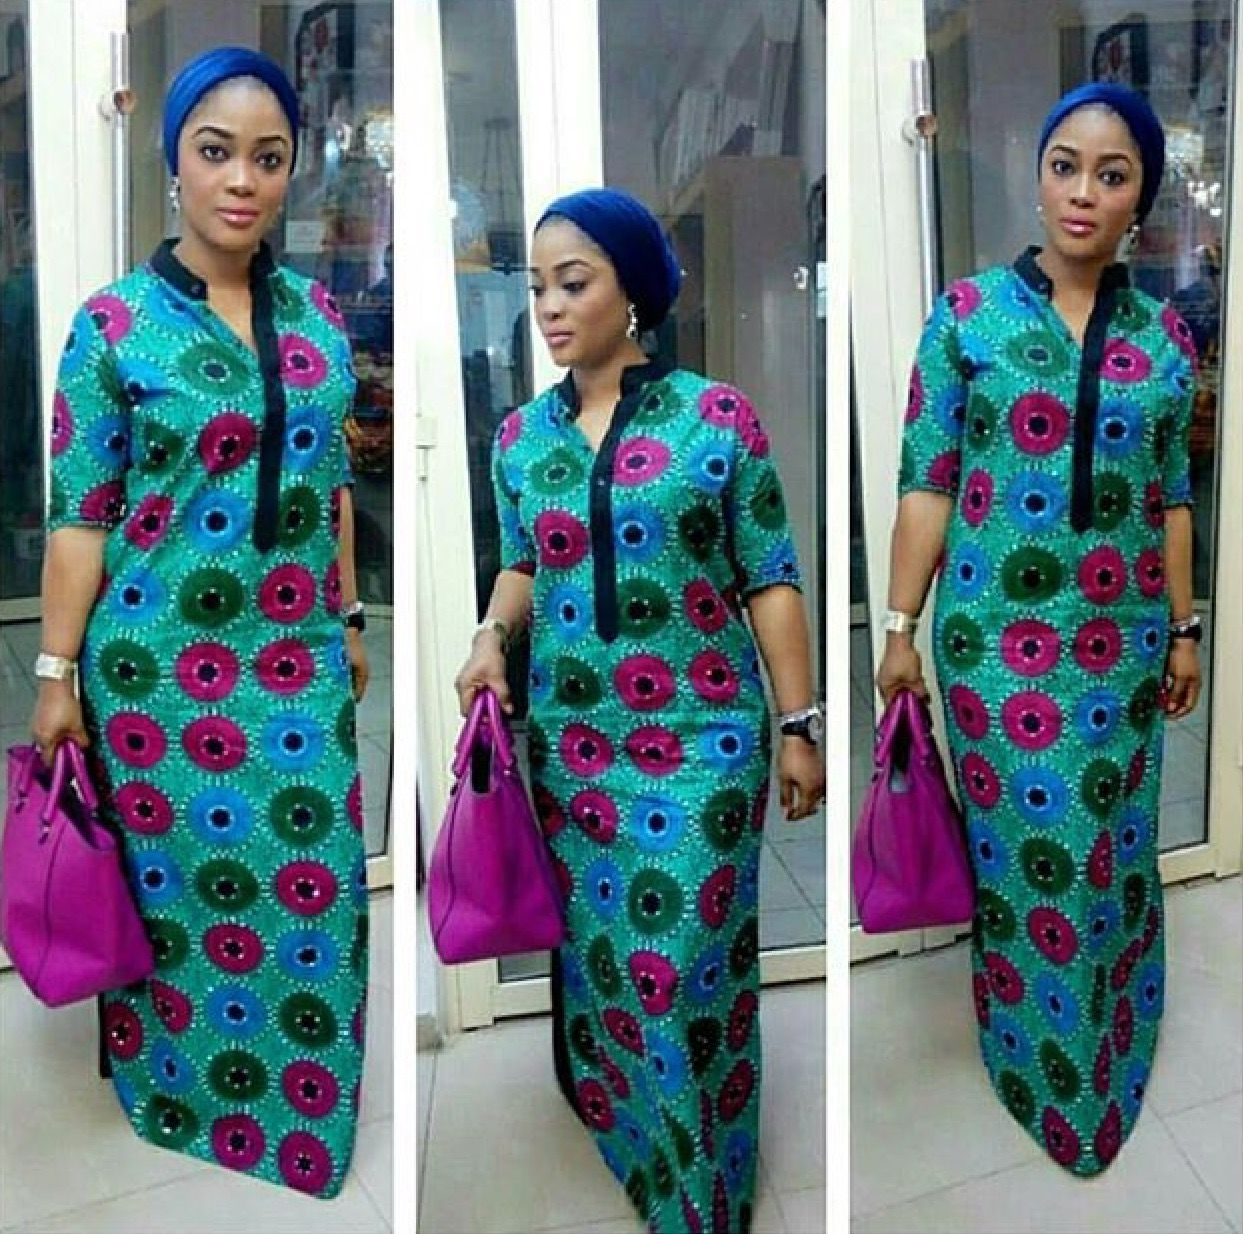 Pingl par gnangui chika sur mode africaine pinterest - Pinterest mode femme ...